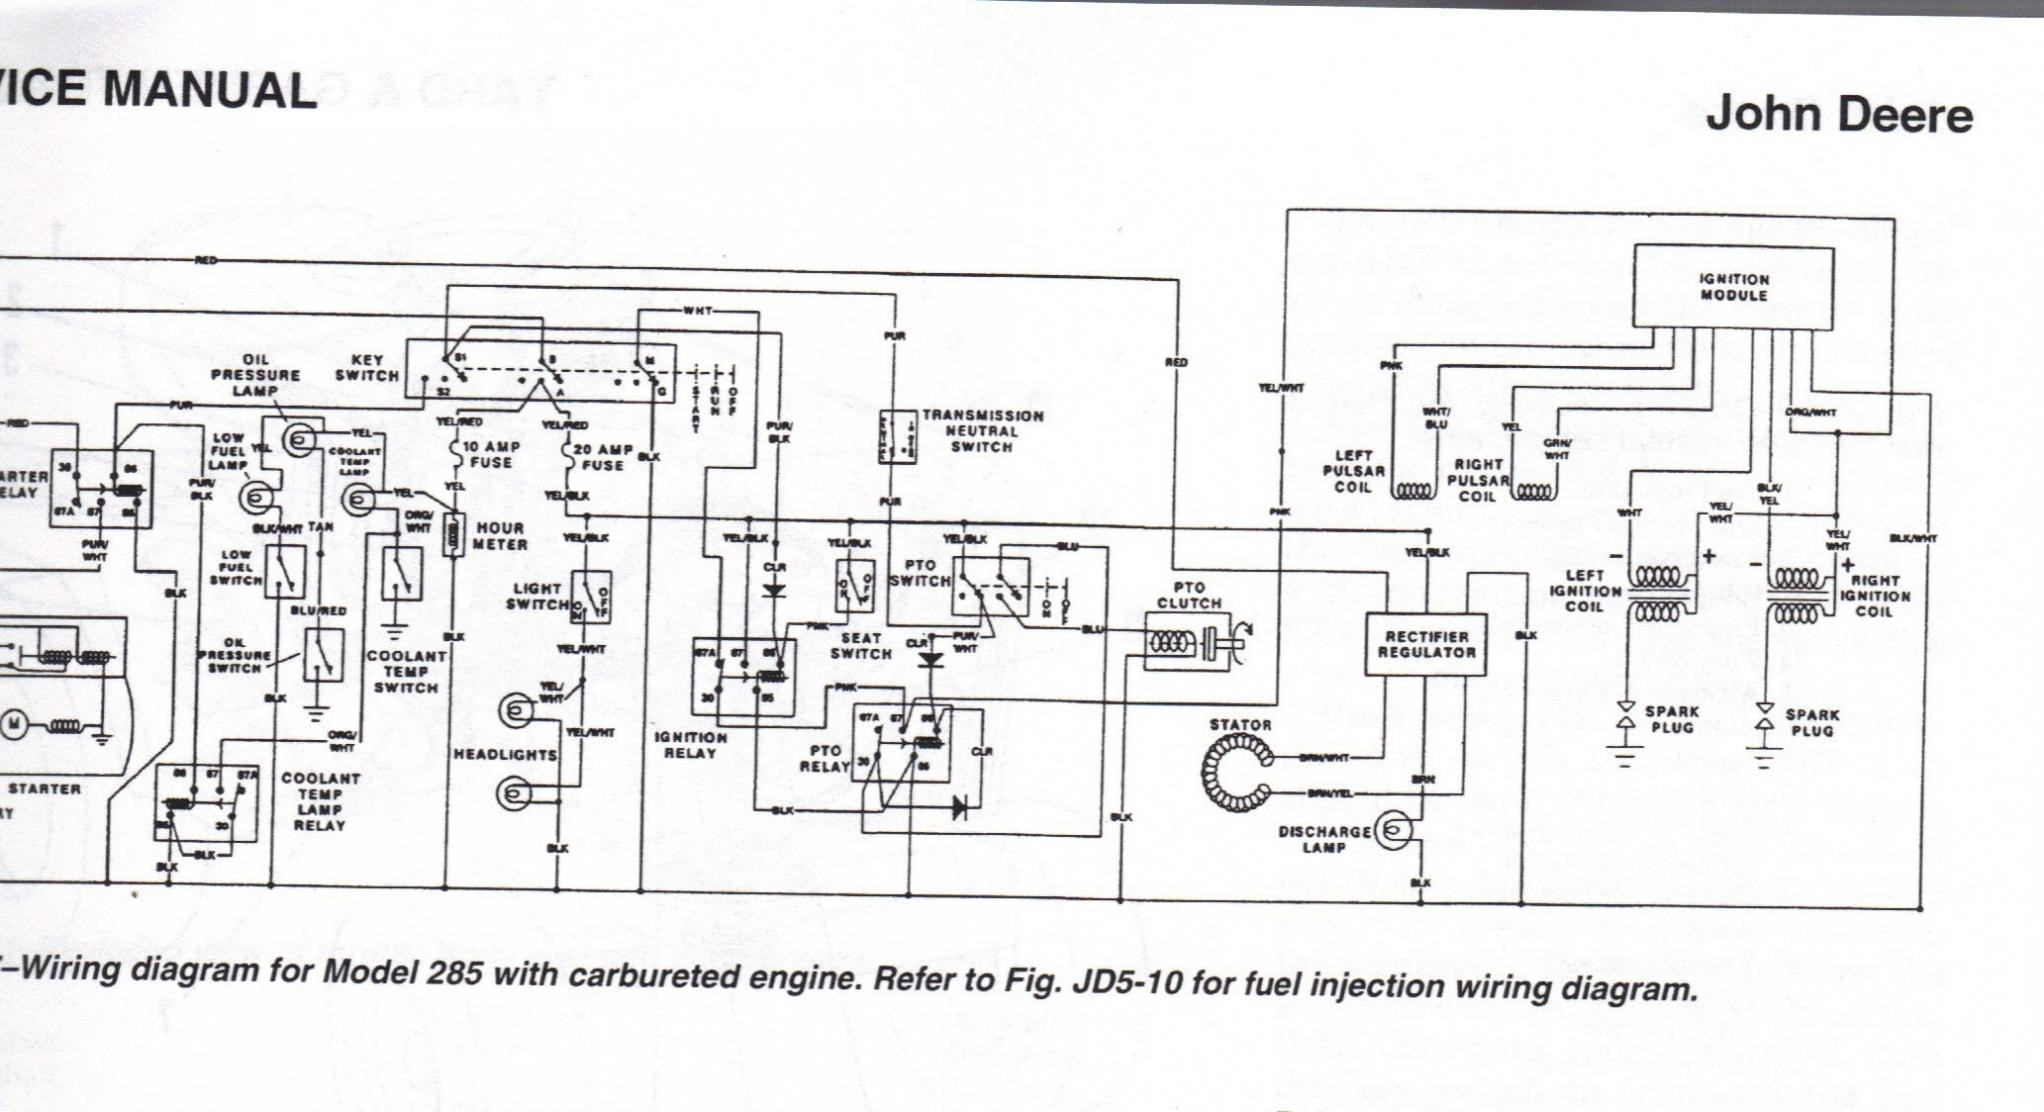 John Deere Gator Electrical Schematic | Wiring Library - John Deere Ignition Switch Wiring Diagram